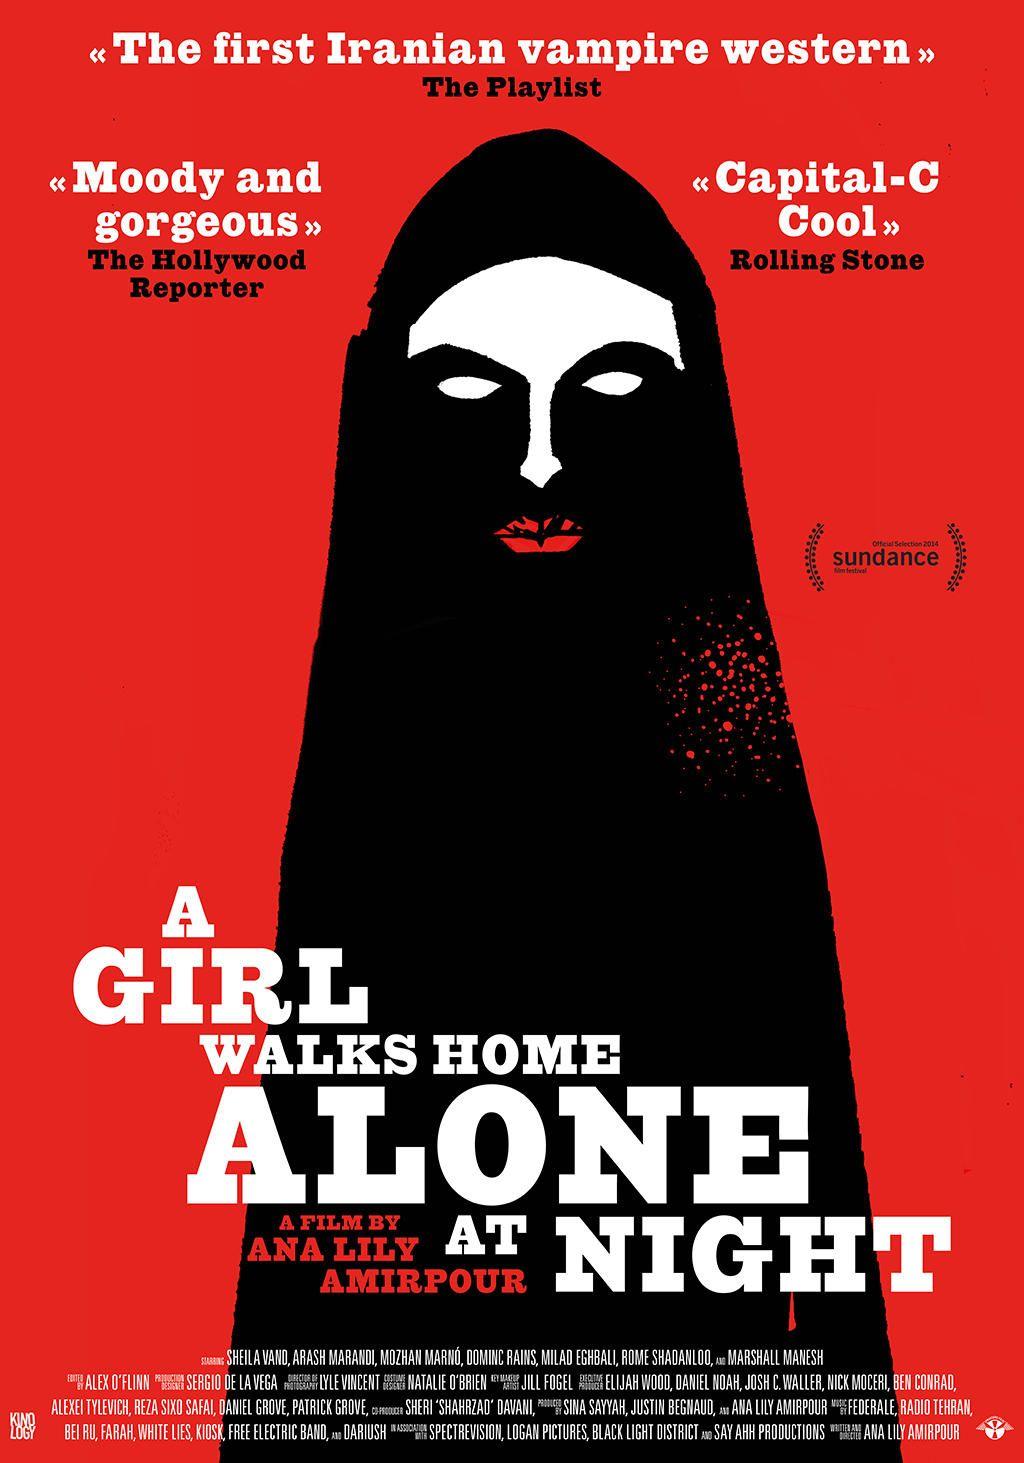 A Girl Walks Home Alone at Night (Девушка возвращается одна ночью домой) - Ana Lily Amirpour (2014)